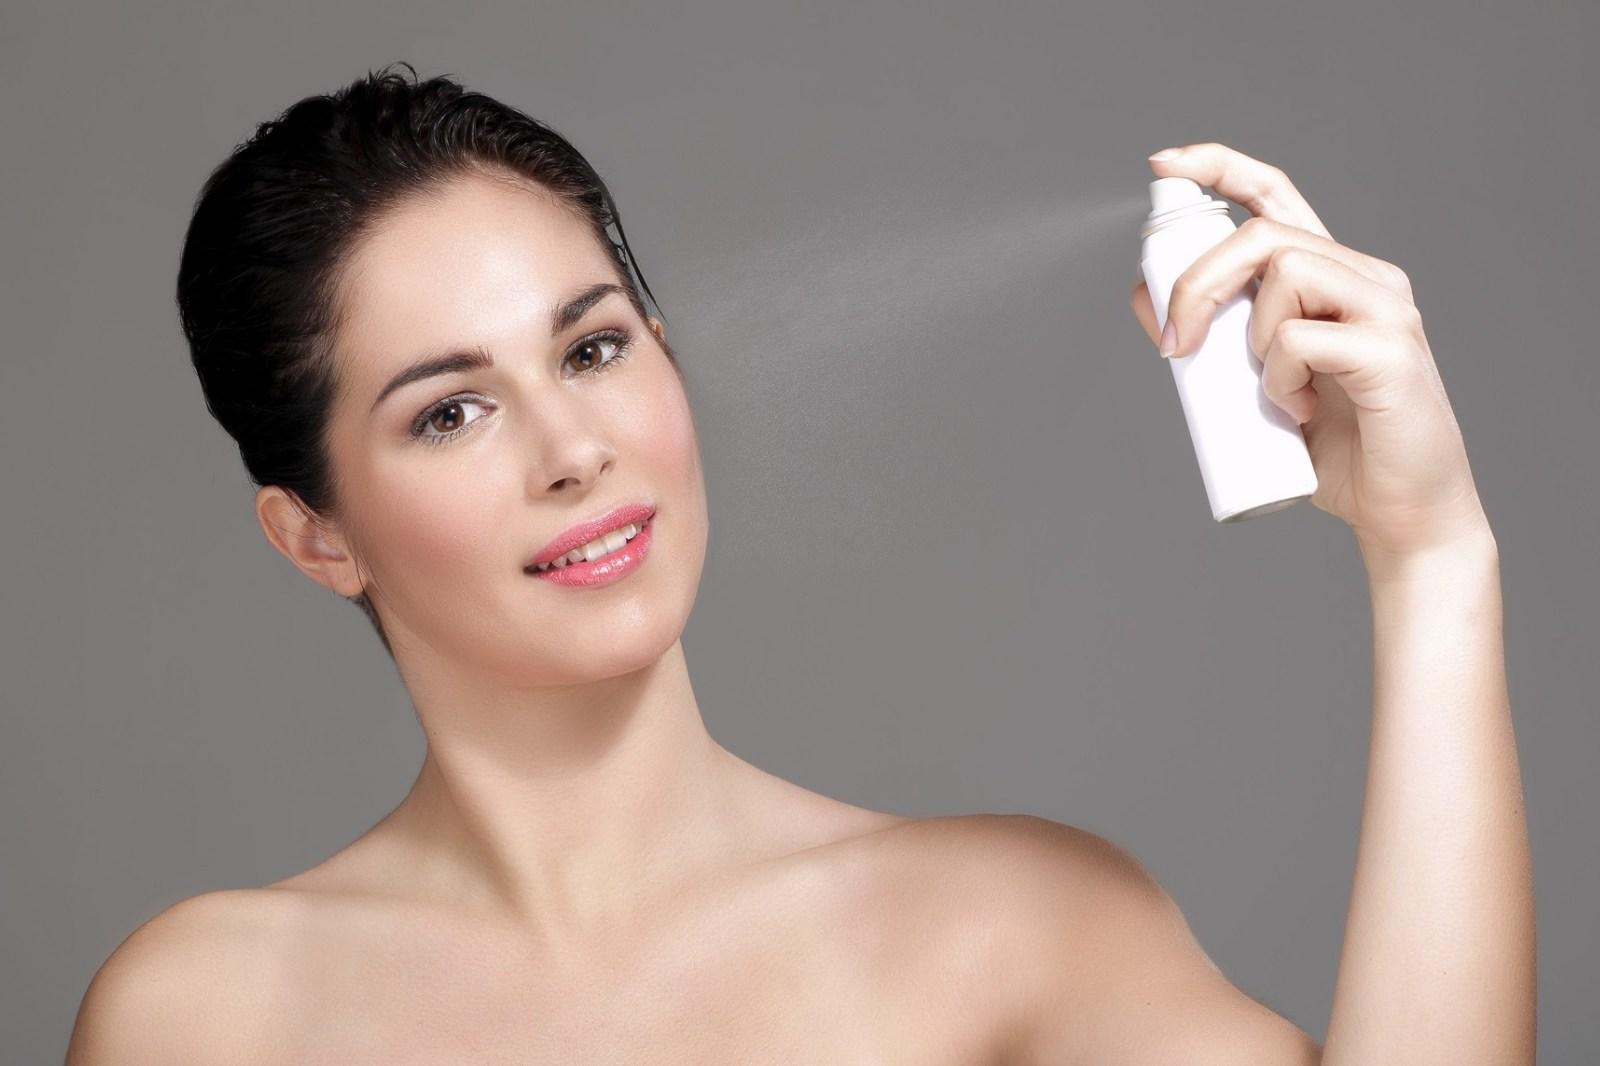 5 semprotan wajah buatan sendiri untuk menyegarkan kulit anda, cara membuat face spray buatan sendiri, kumpulan bahan alami untuk spray wajah buatan sendiri, baca resep spray wajah